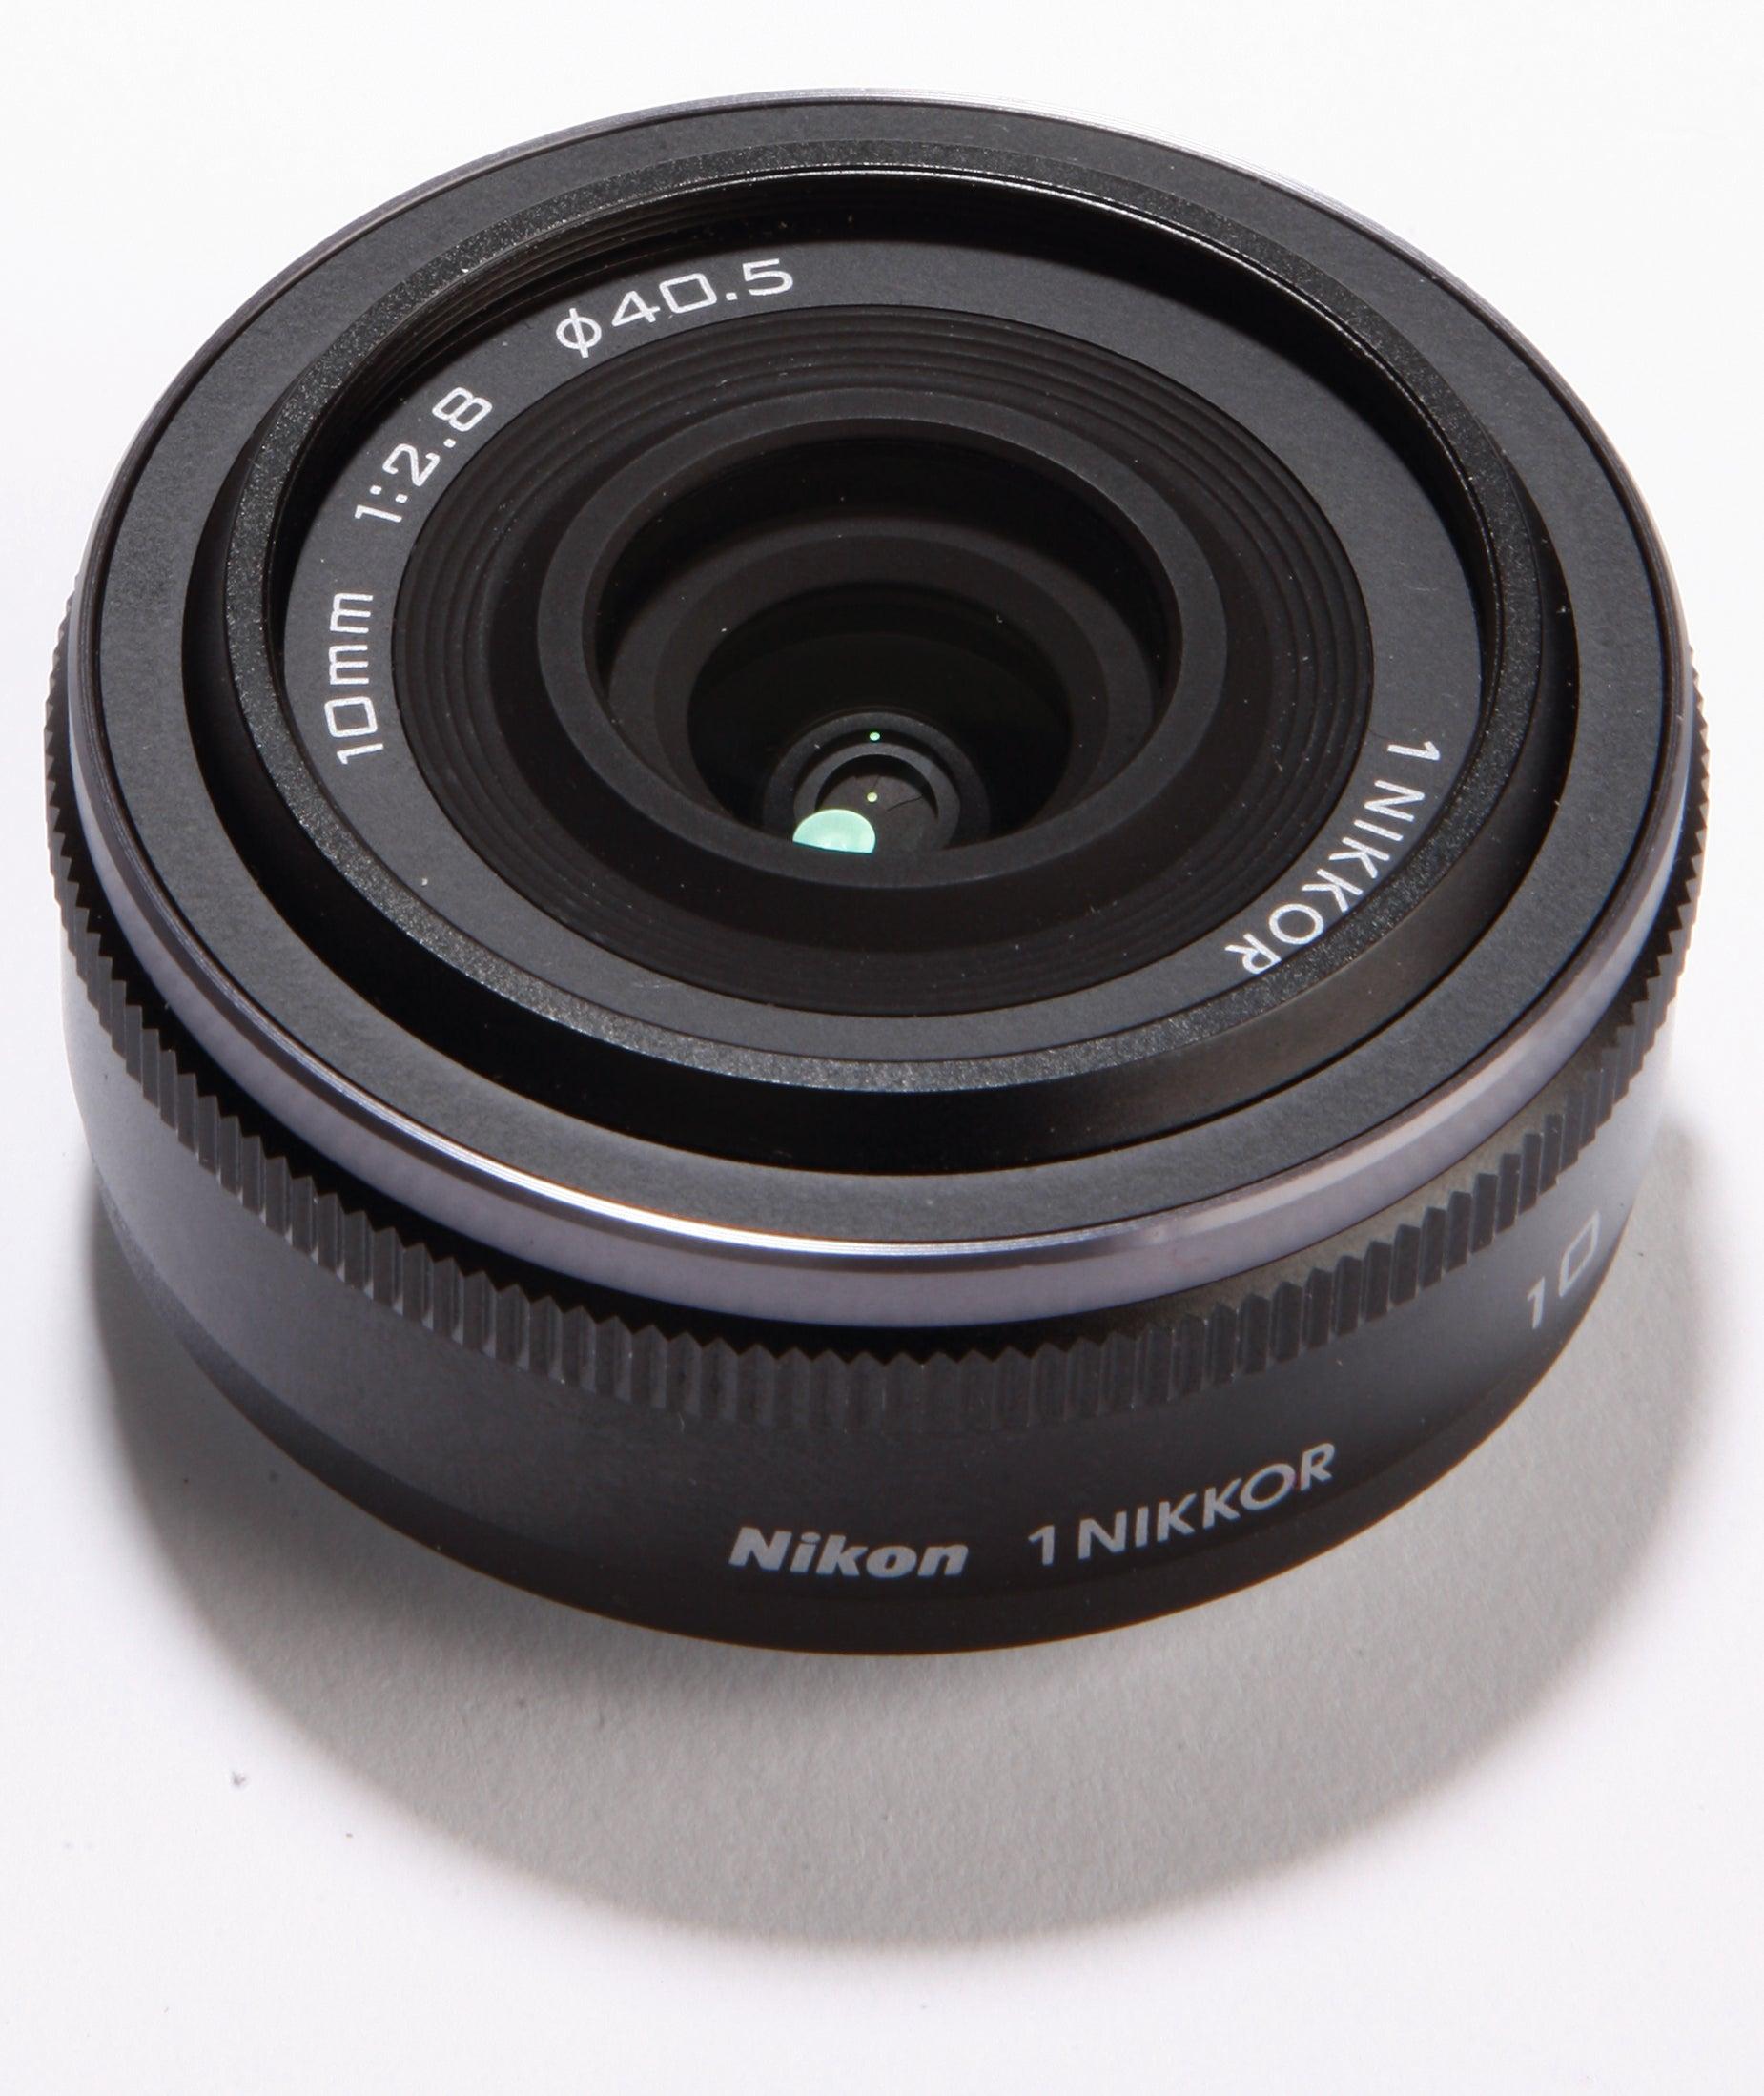 d4d8604410f Nikon 1 Nikkor 10mm f/2.8 Pancake Review